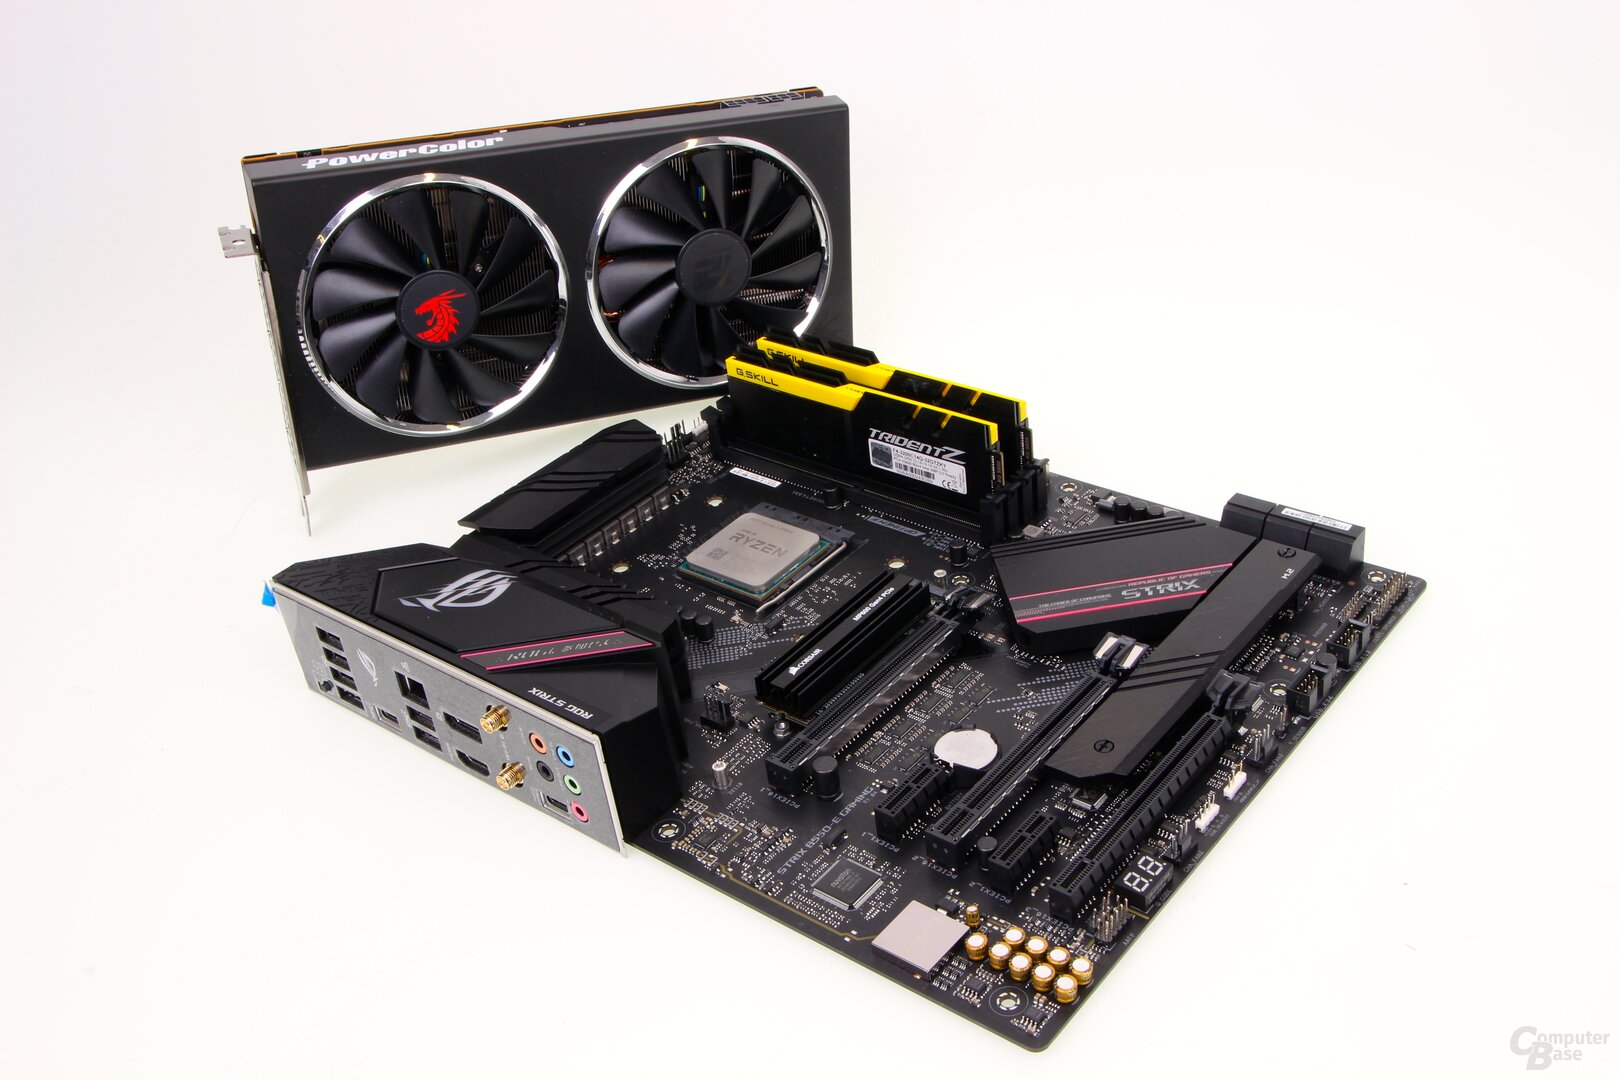 Asus ROG Strix B550-E Gaming, AMD Ryzen 7 3700X, 16 GByte G.Skill DDR4-3200, PowerColor Radeon RX 5700, Corsair MP600 PCIe-4.0-SSD